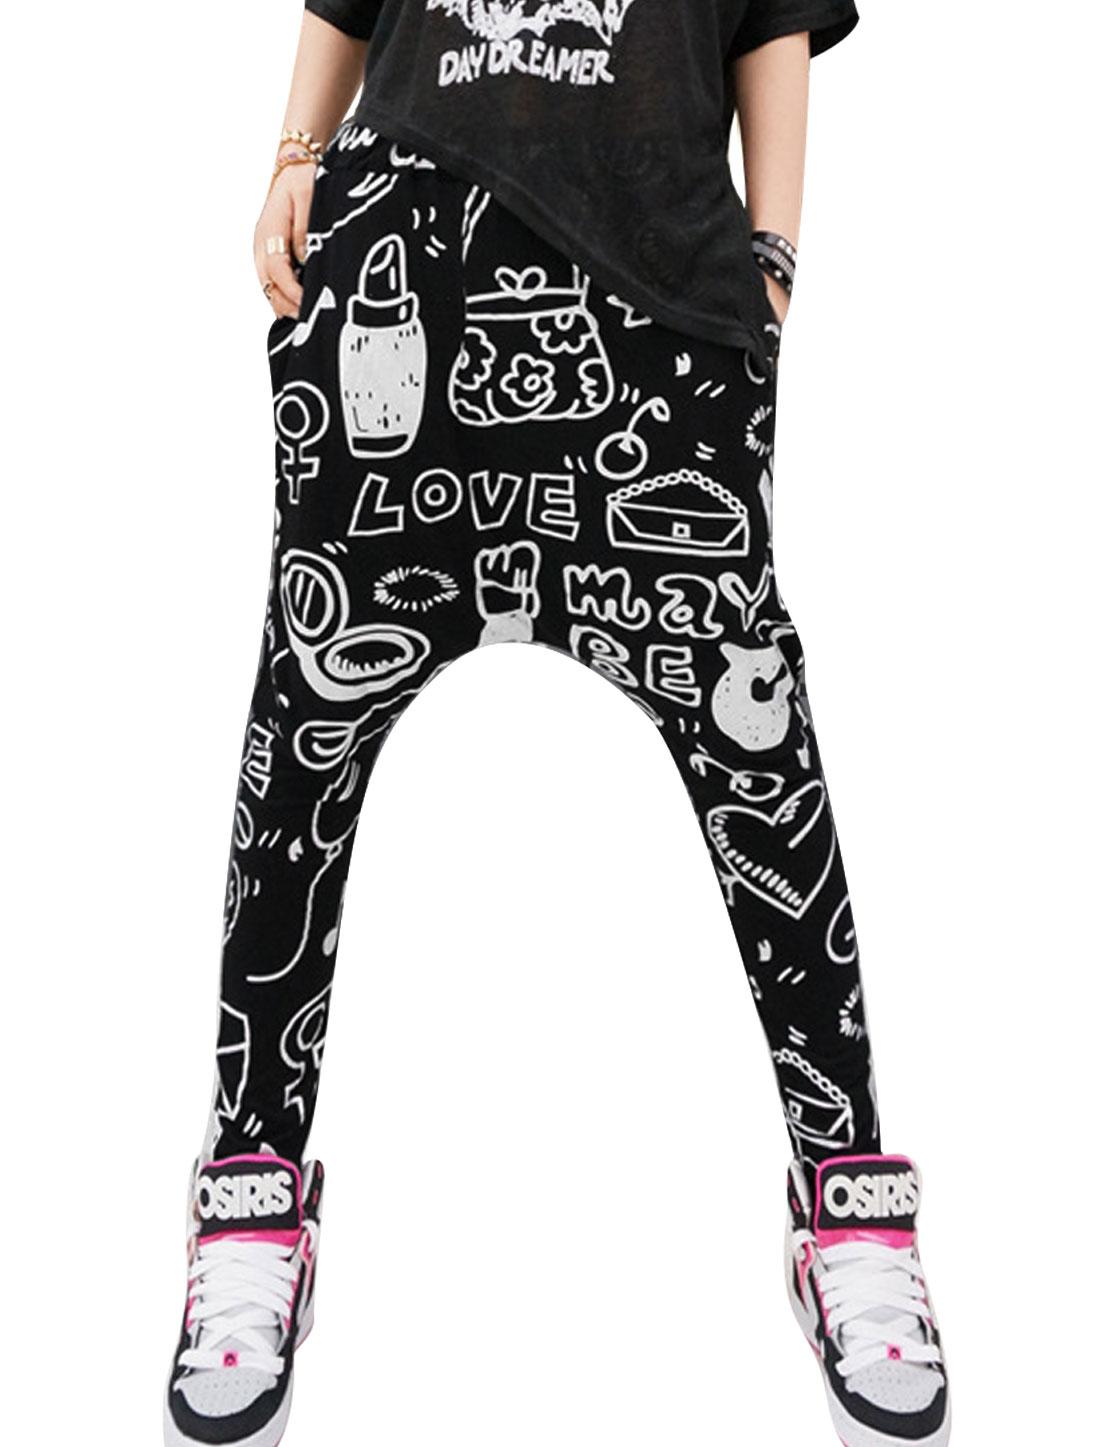 Lady Elastic Waist Novelty Prints Cozy Fit Harem Pants Sliver Black XS